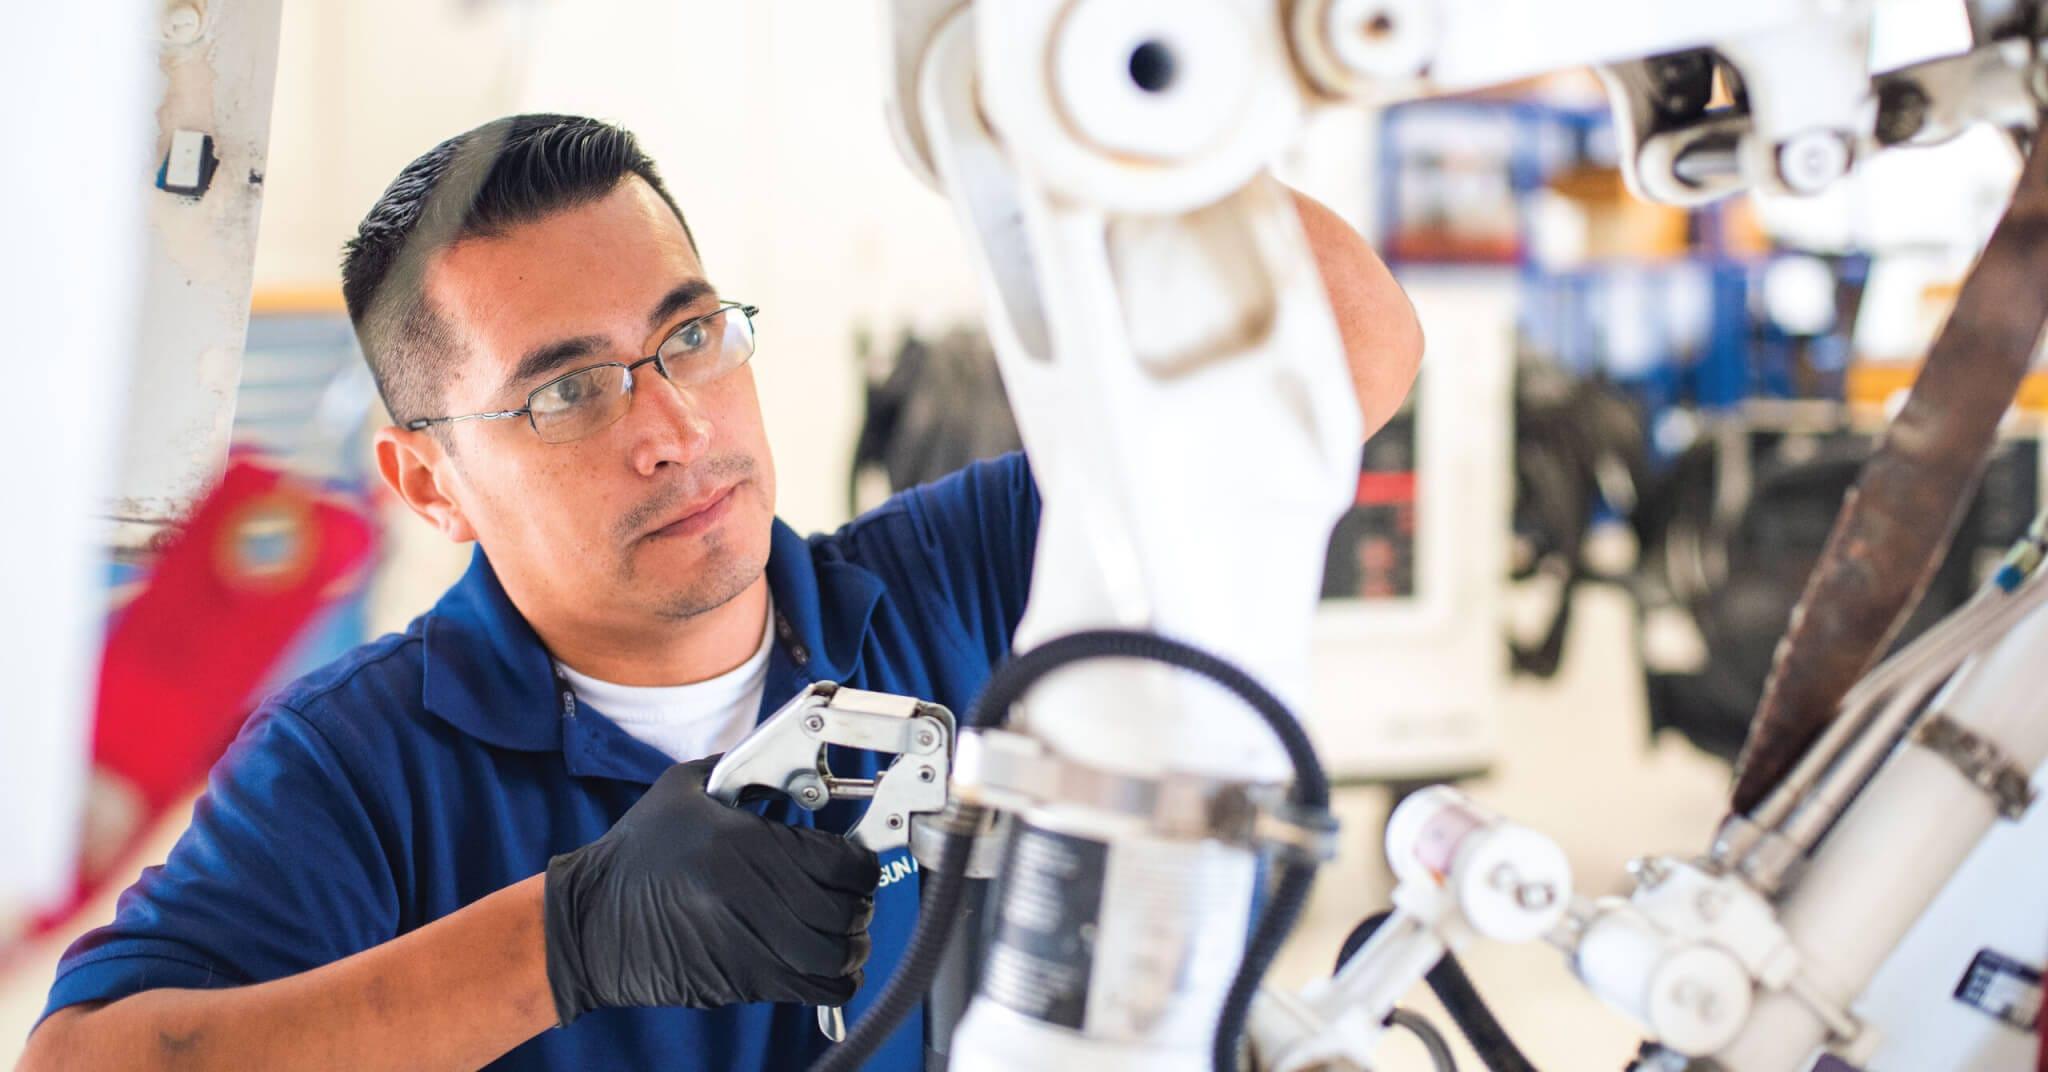 private aircraft maintenance technician